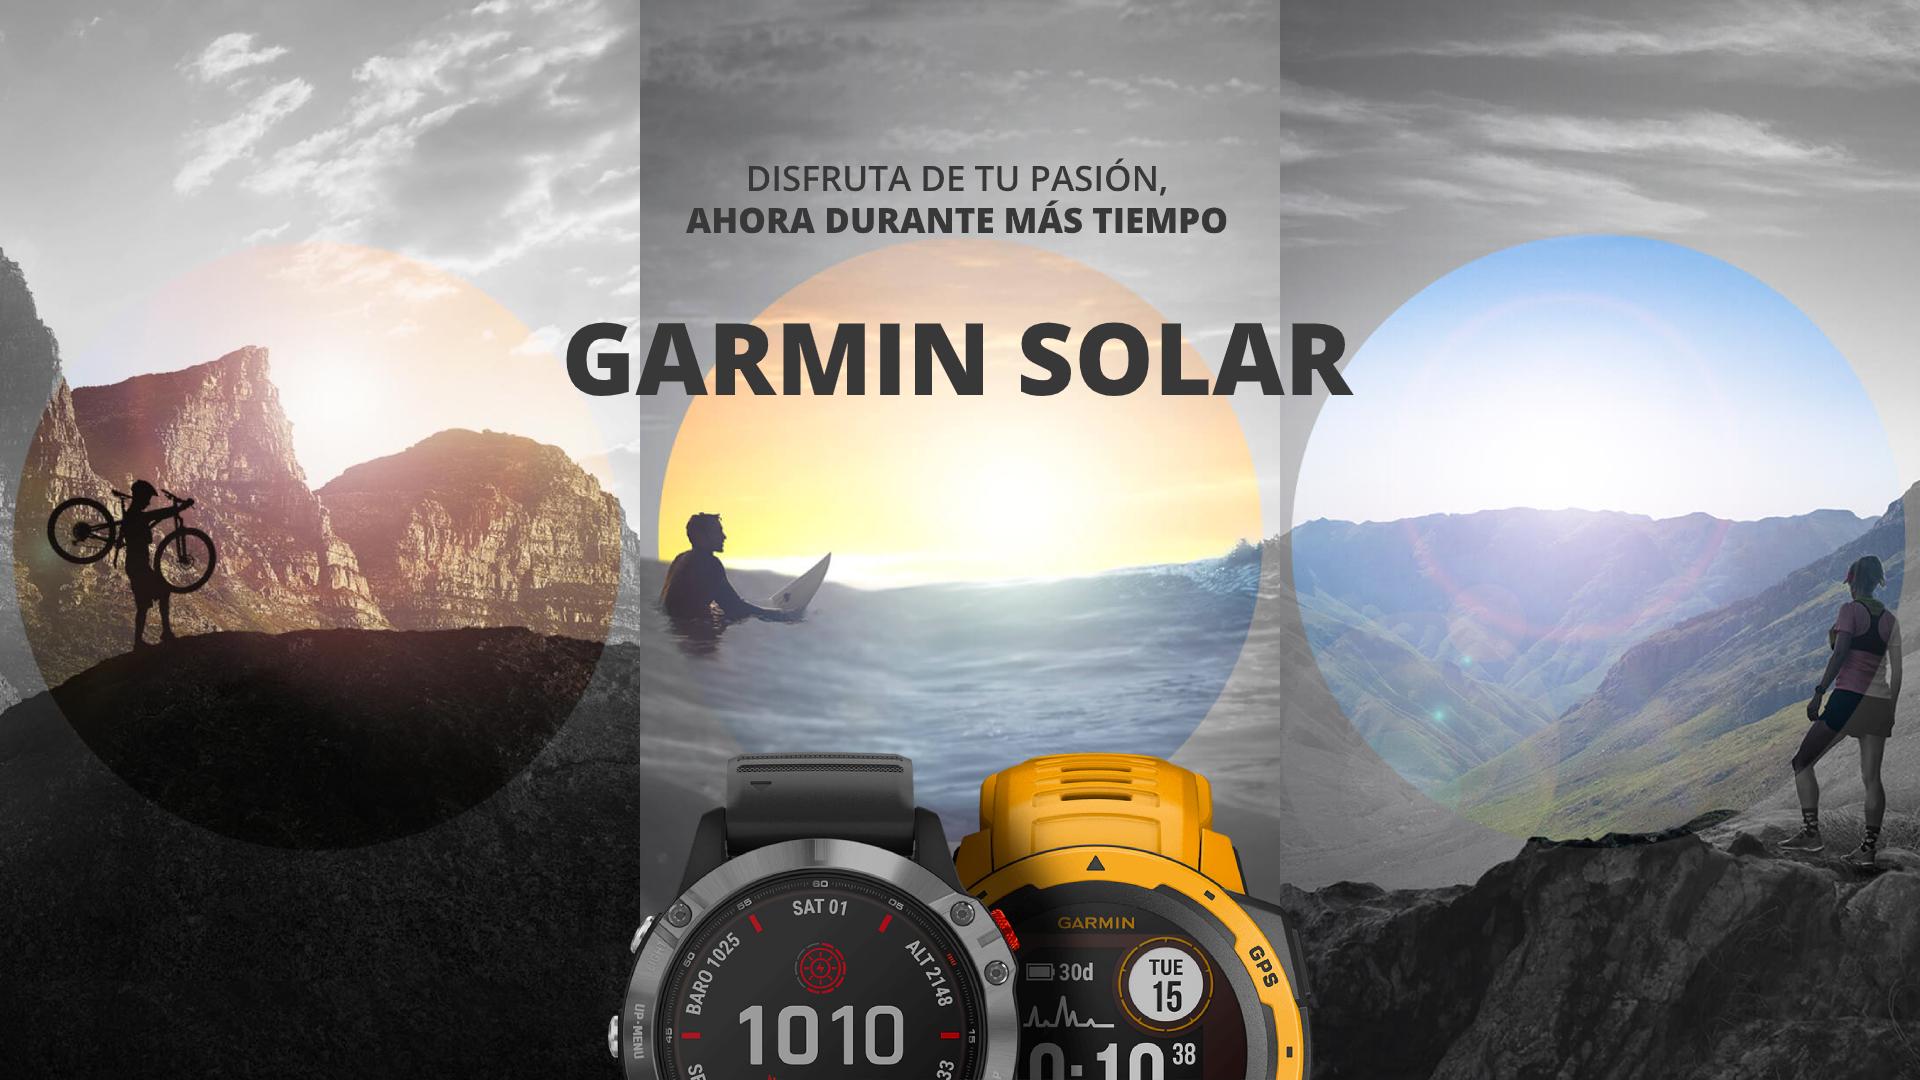 Garmin Solar